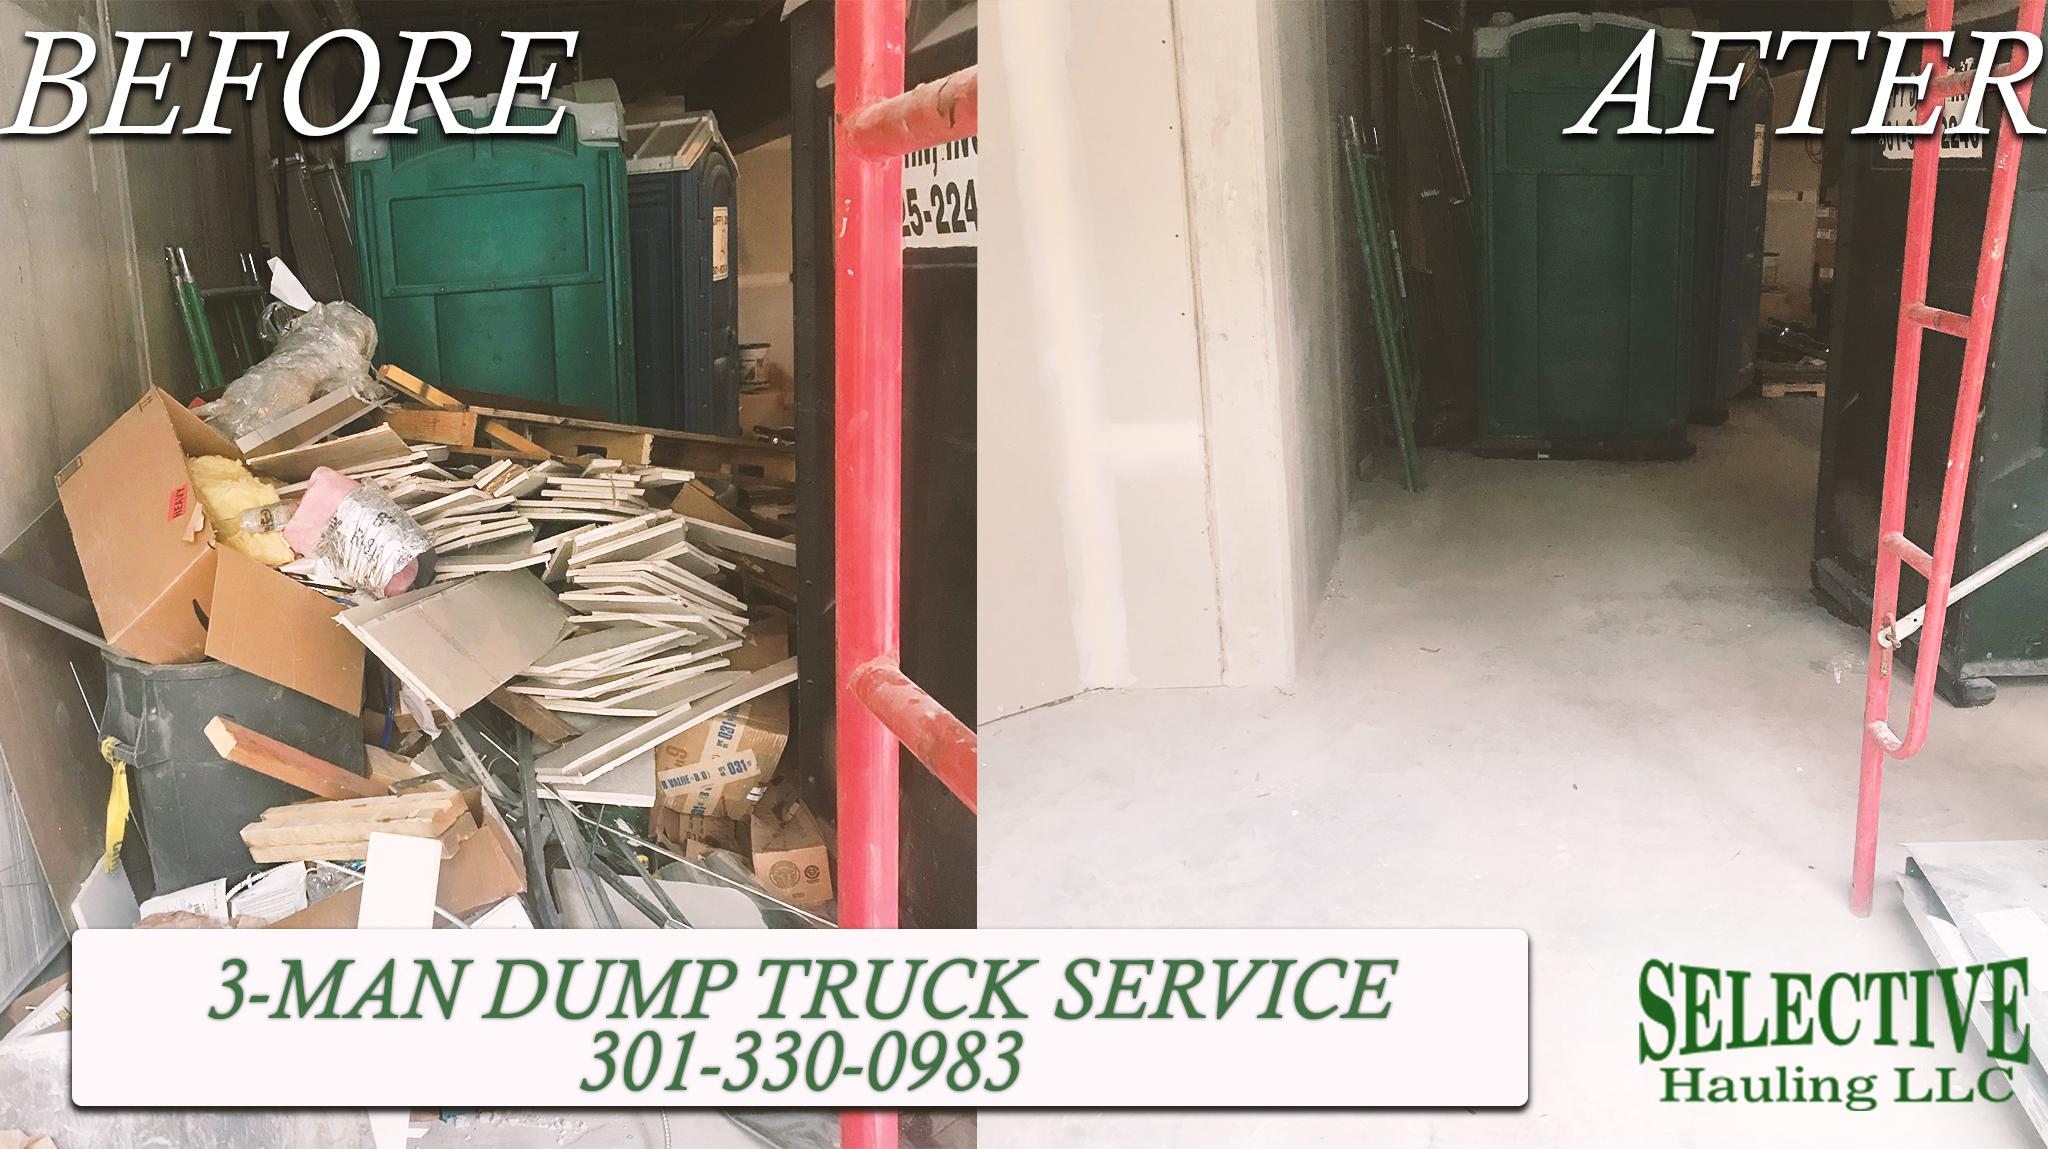 Northern Virginia junk removal service